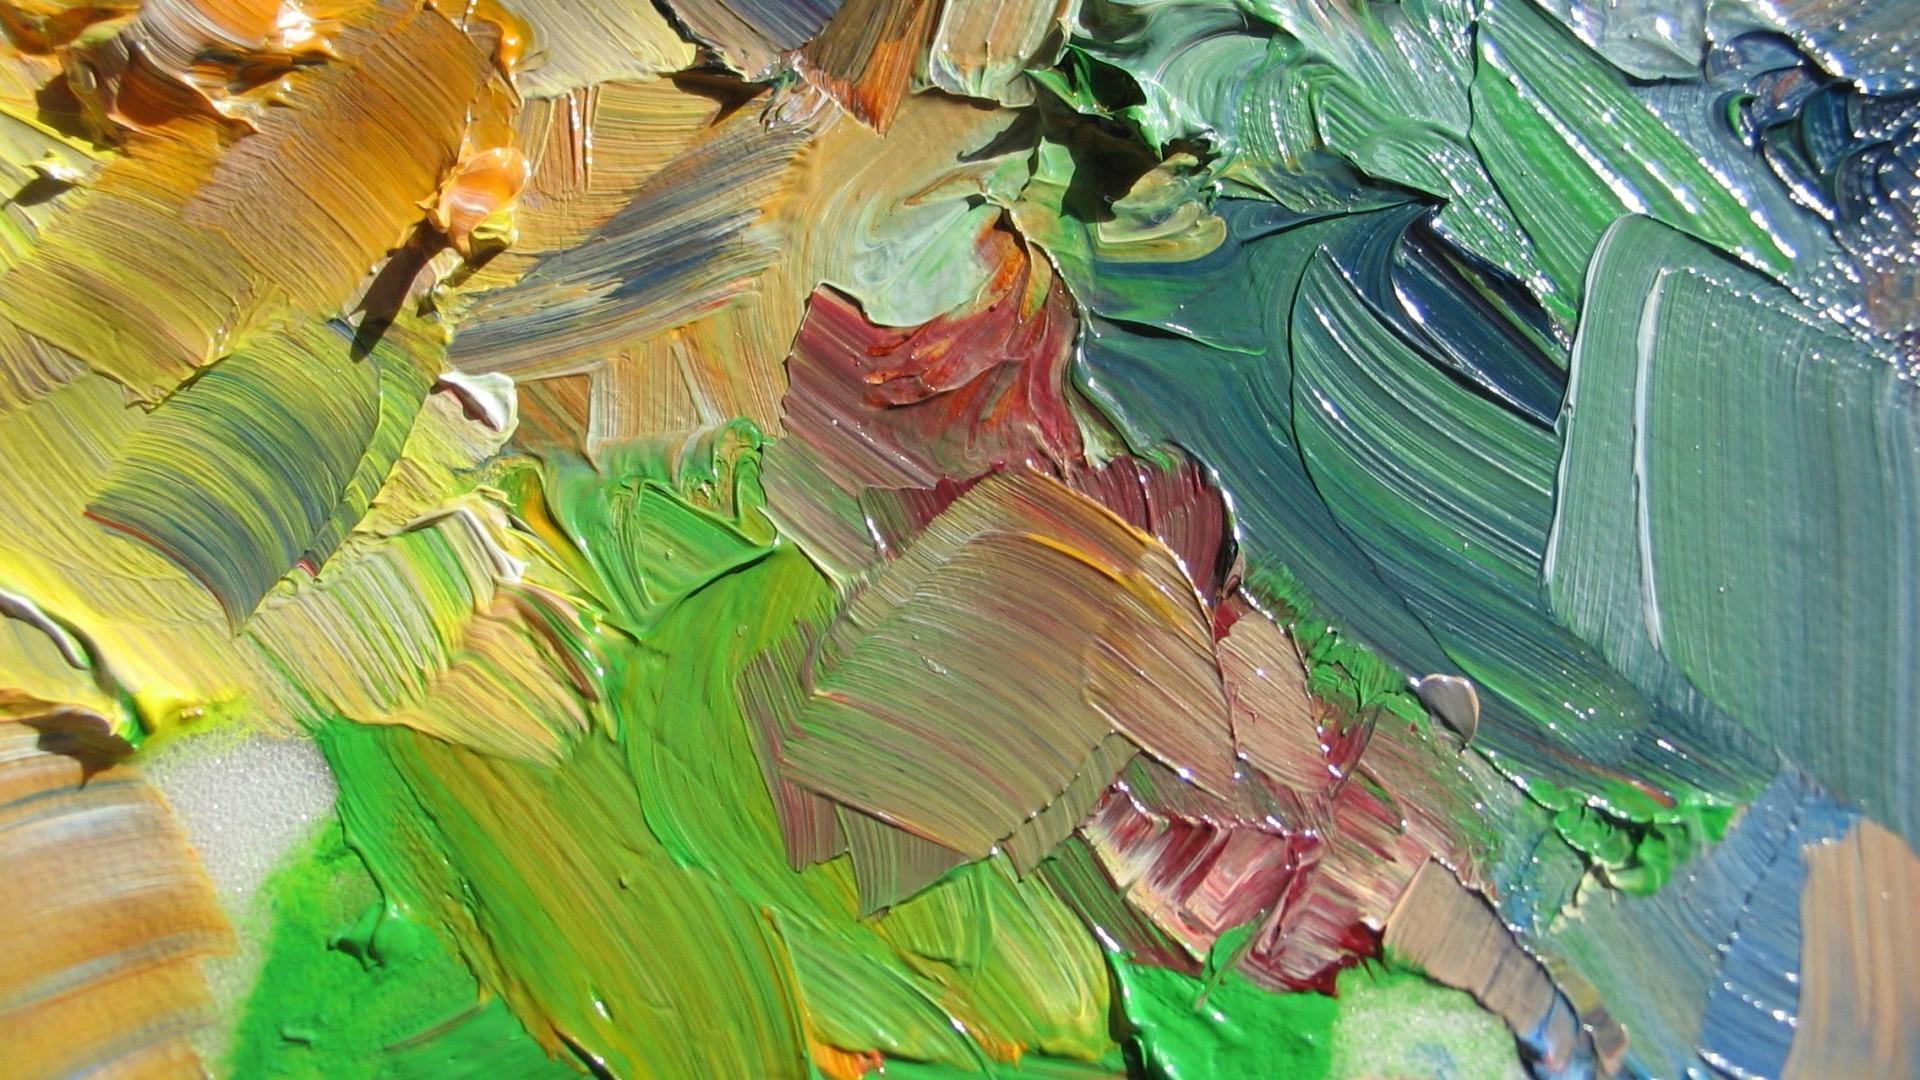 wallpaper 1920x1080 px colorful oil painting paint splatter